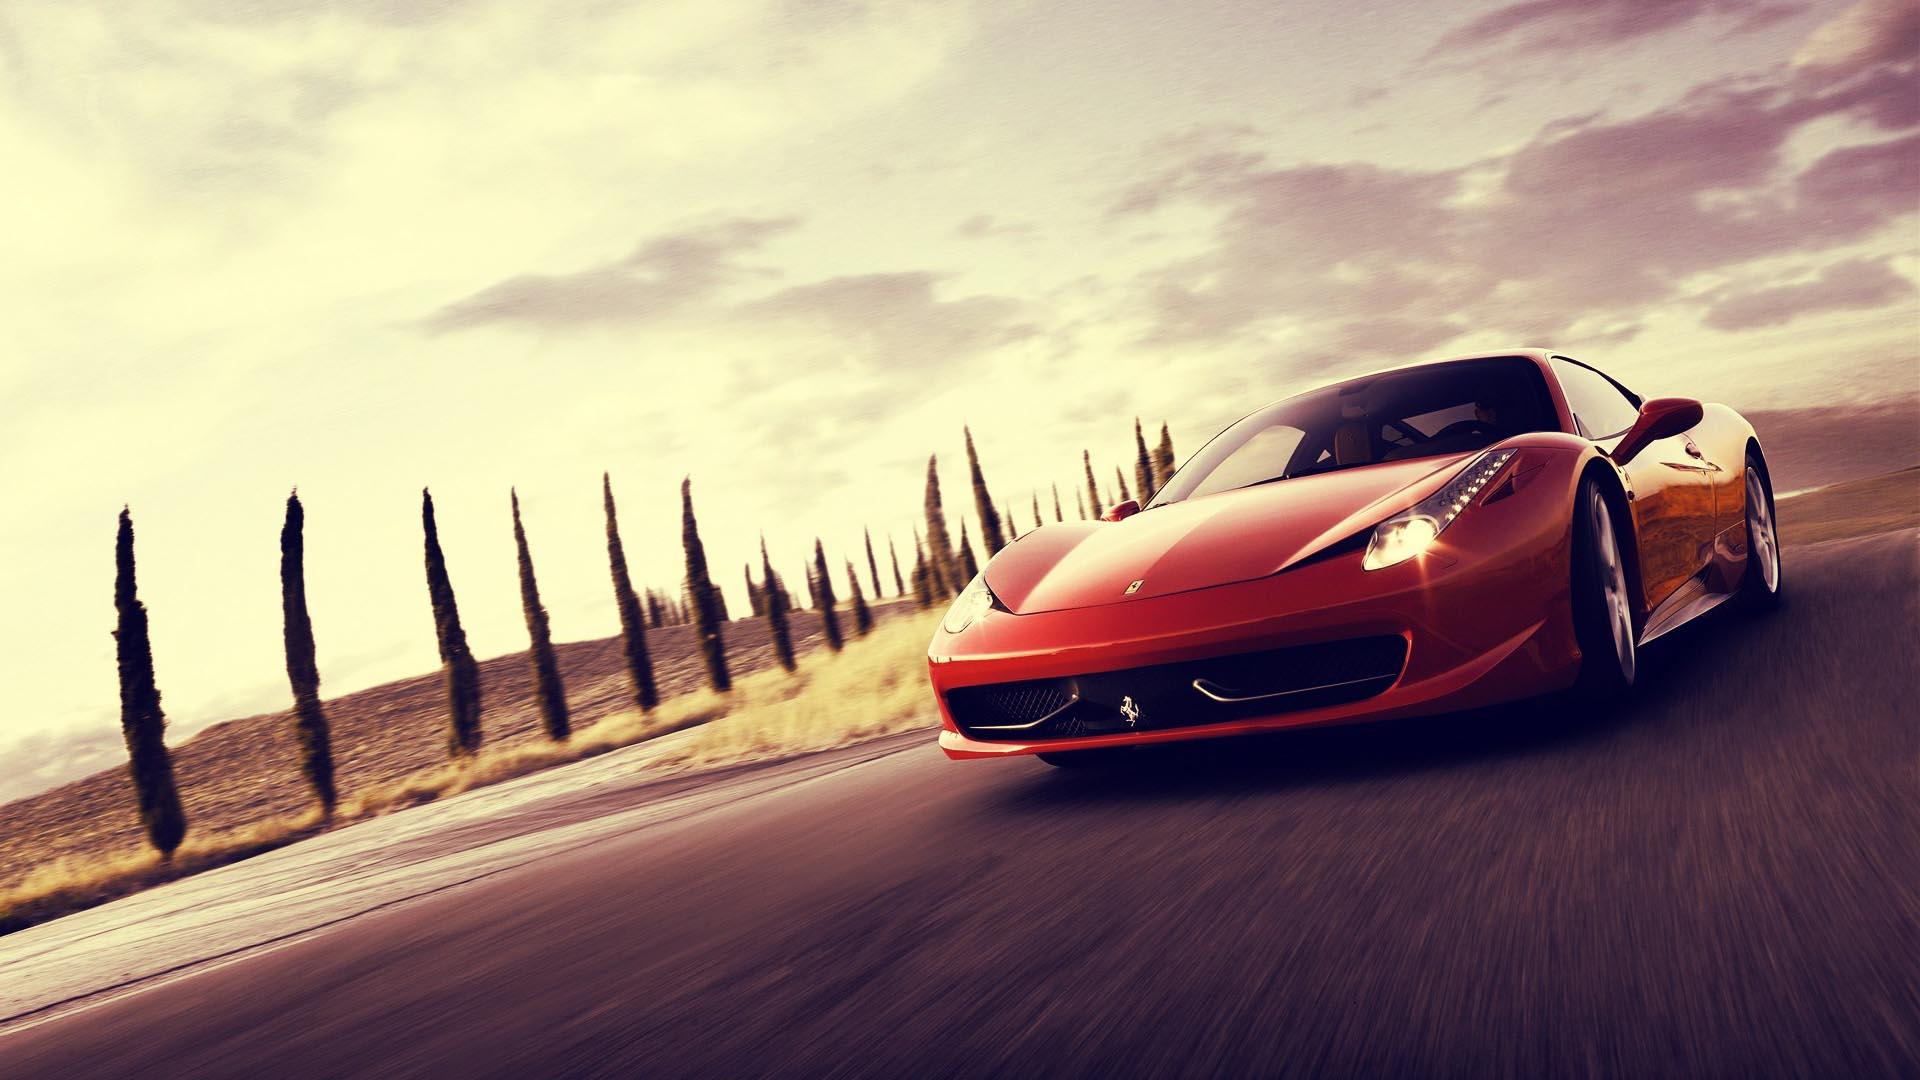 Cars Full HD Wallpapers download 1080p desktop backgrounds 1920x1080